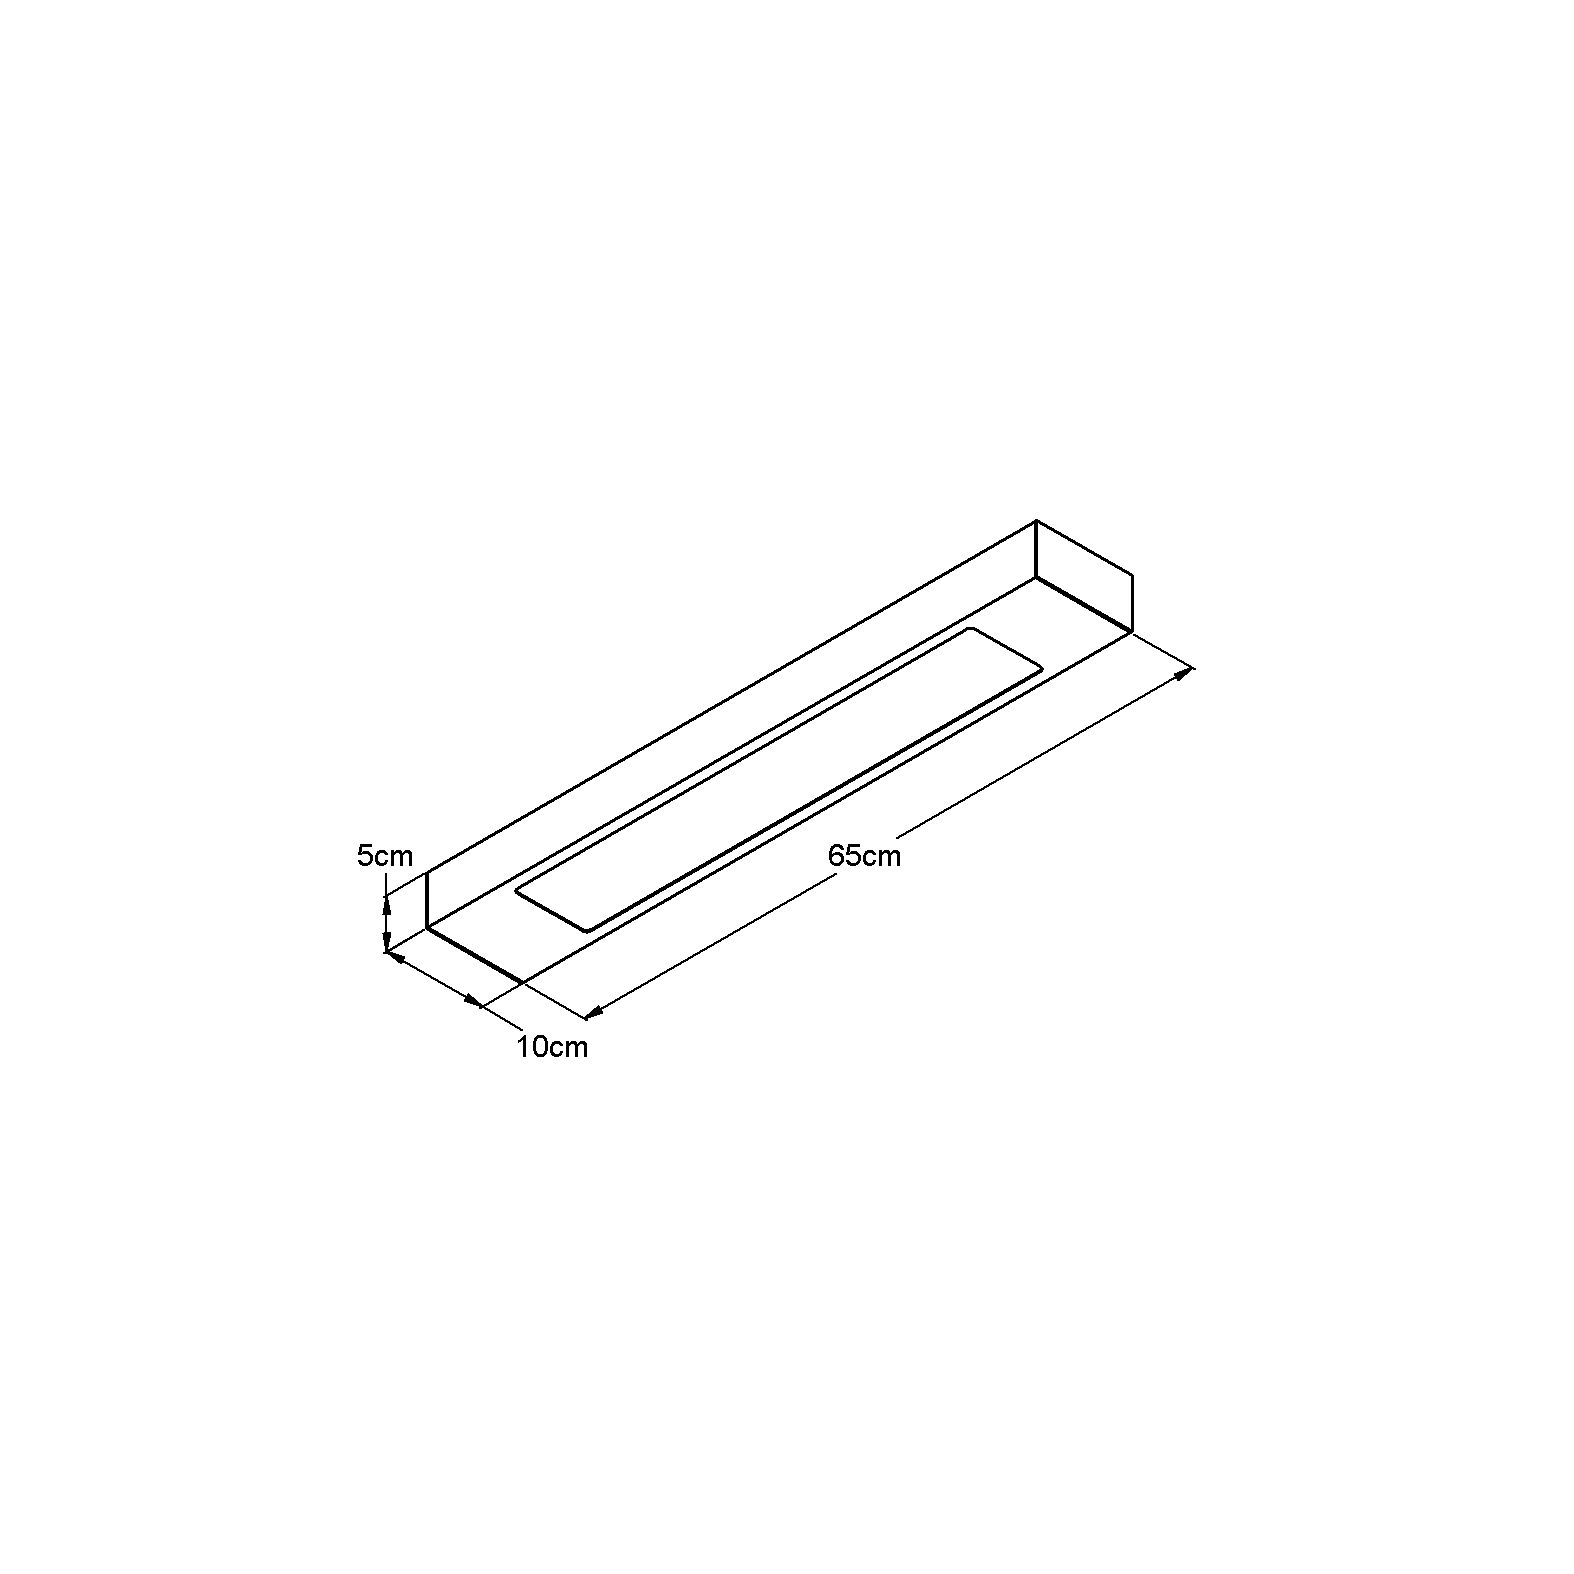 Luminária Plafon Retangular 2 Lâmp. 65cm Alumínio Branco Arky